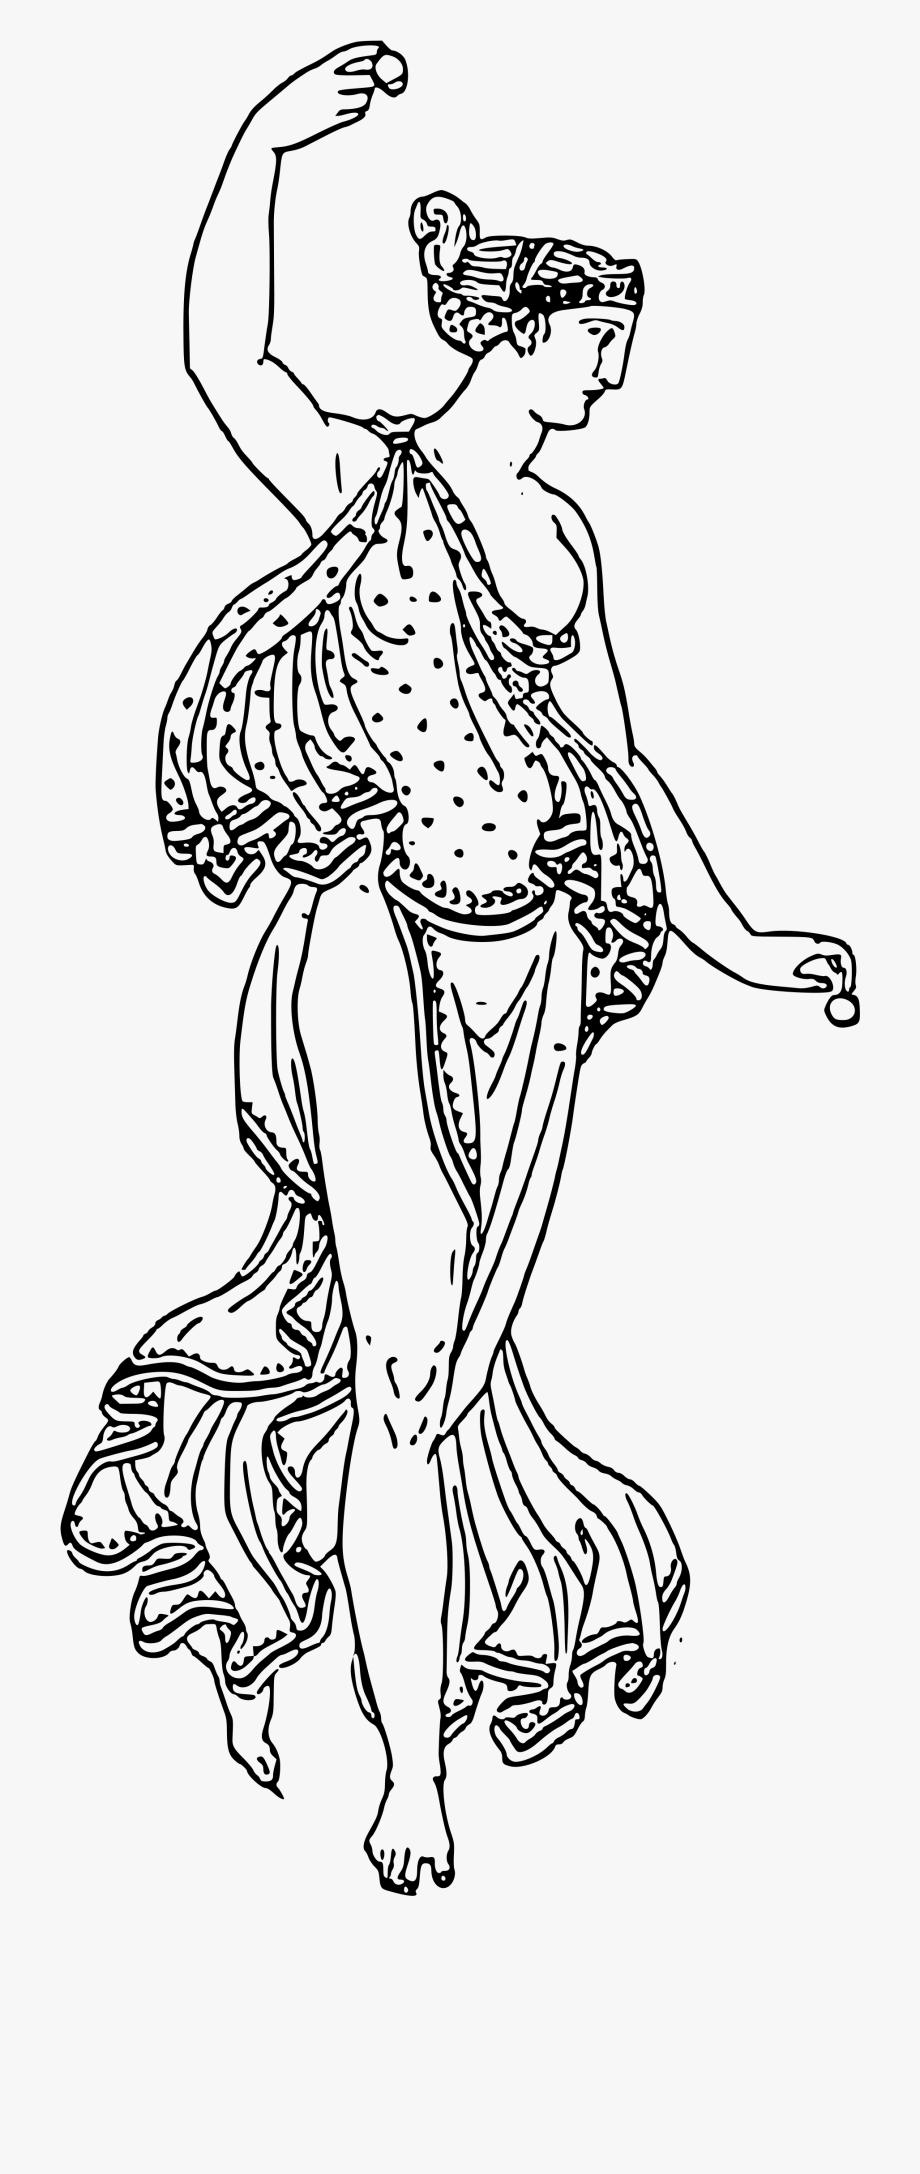 Greek clipart dancer greek. Transparent black and white